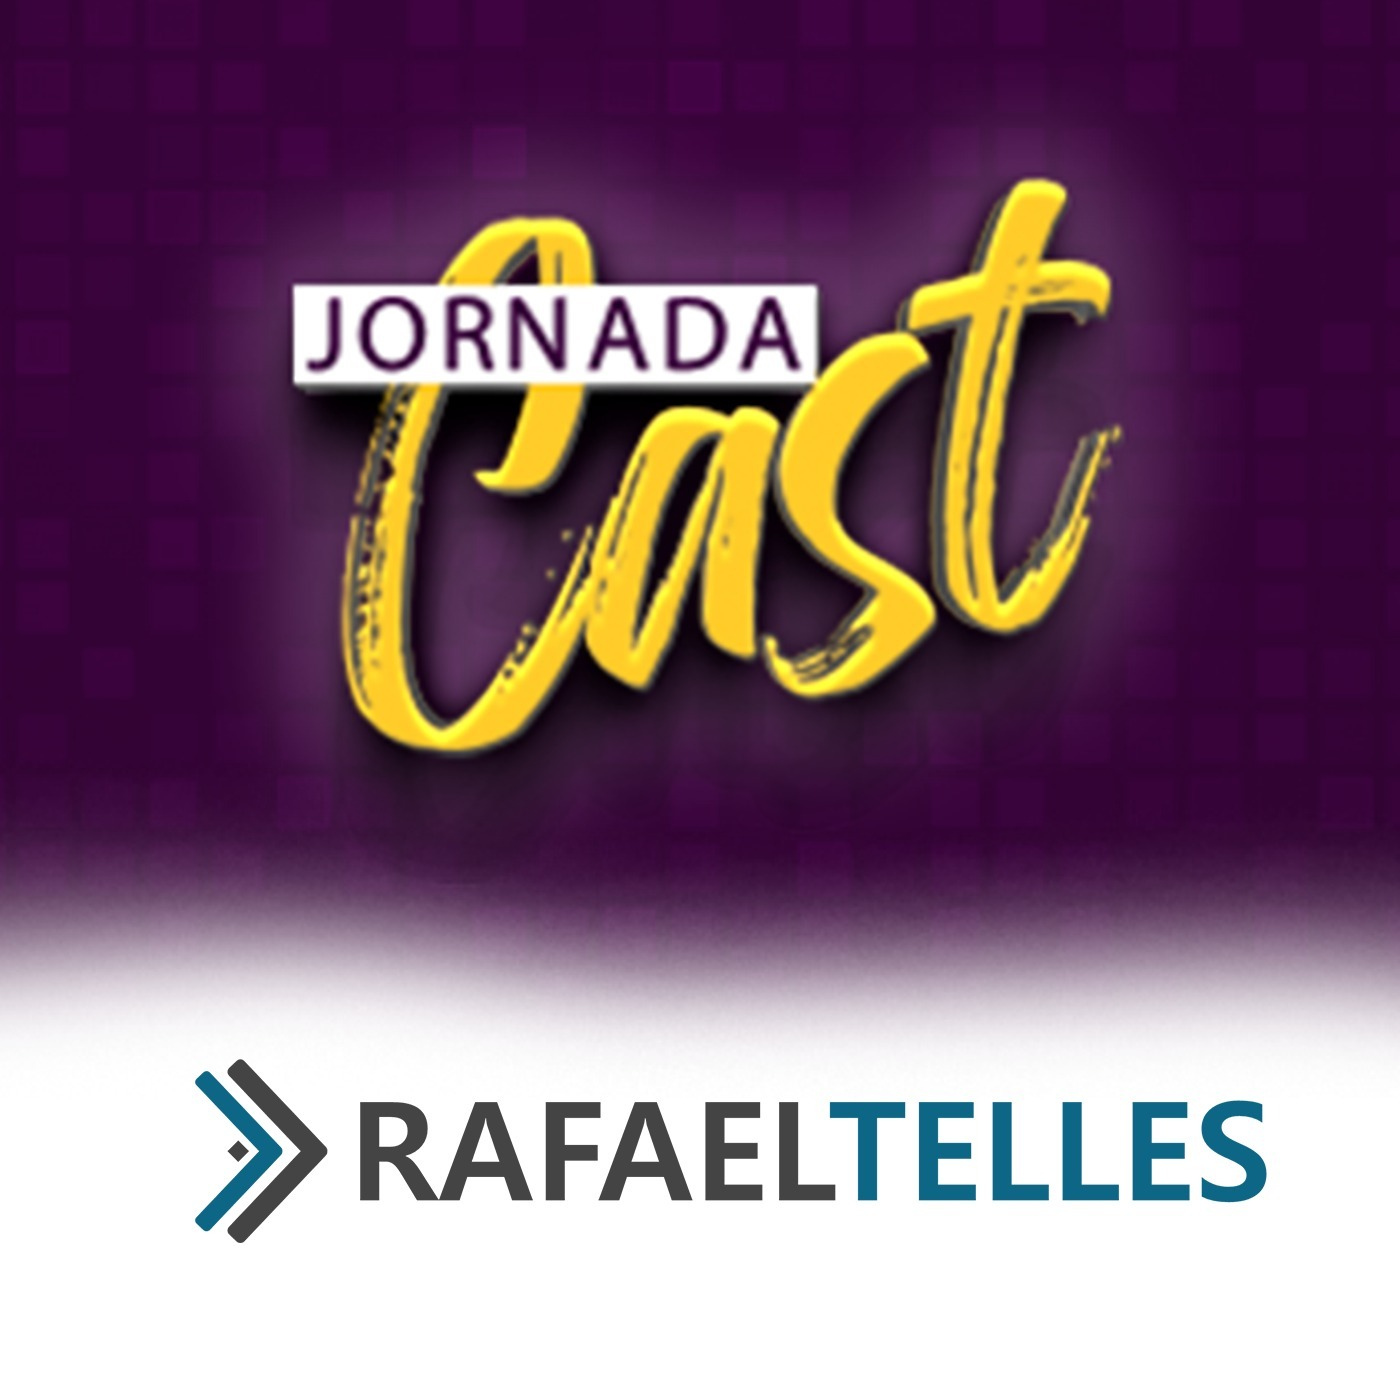 Jornada Cast